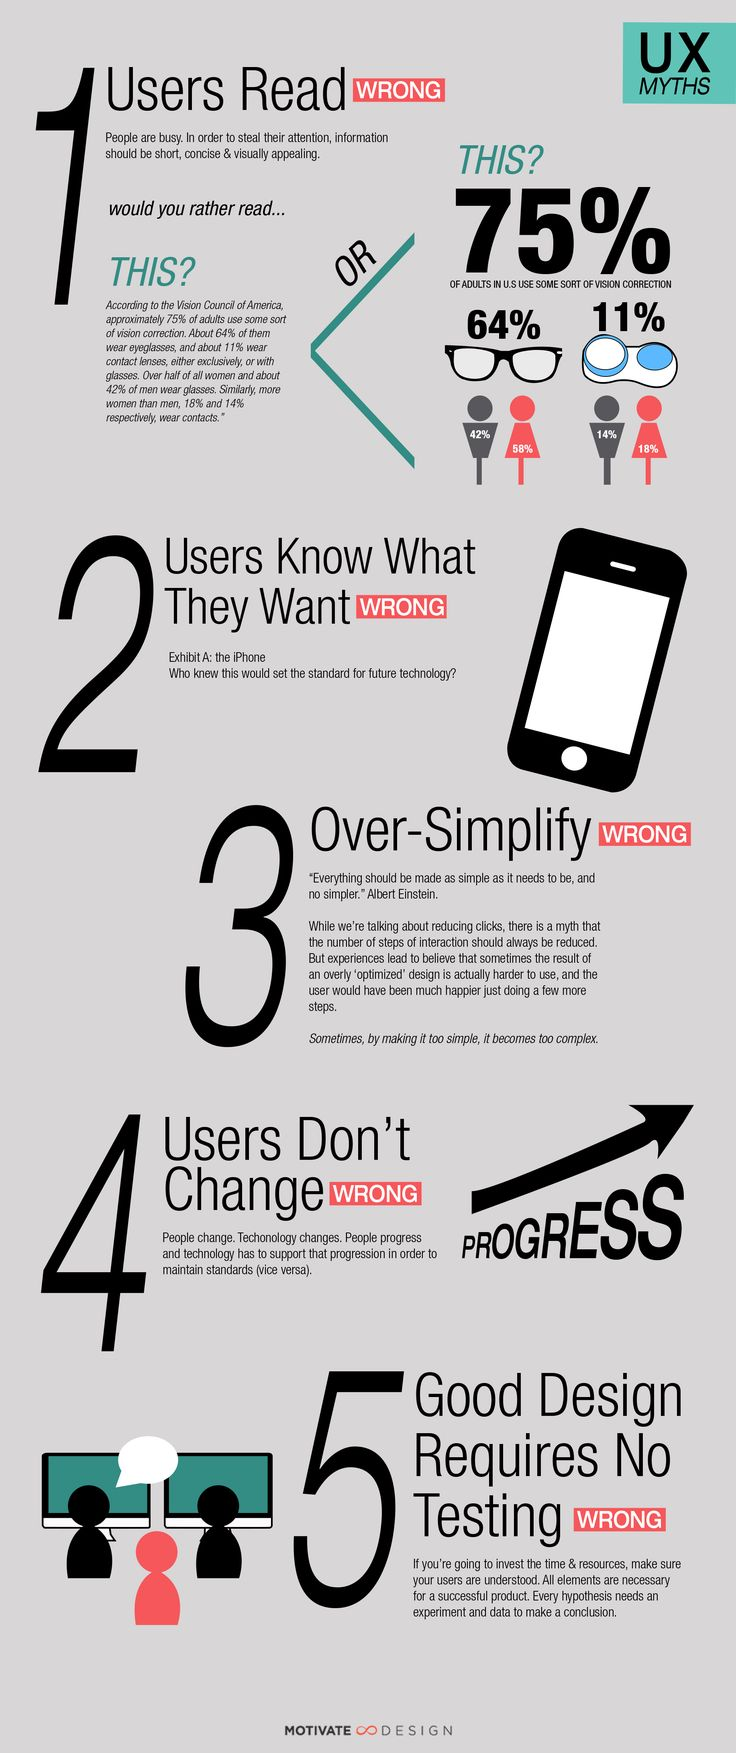 Some UX myths #ux